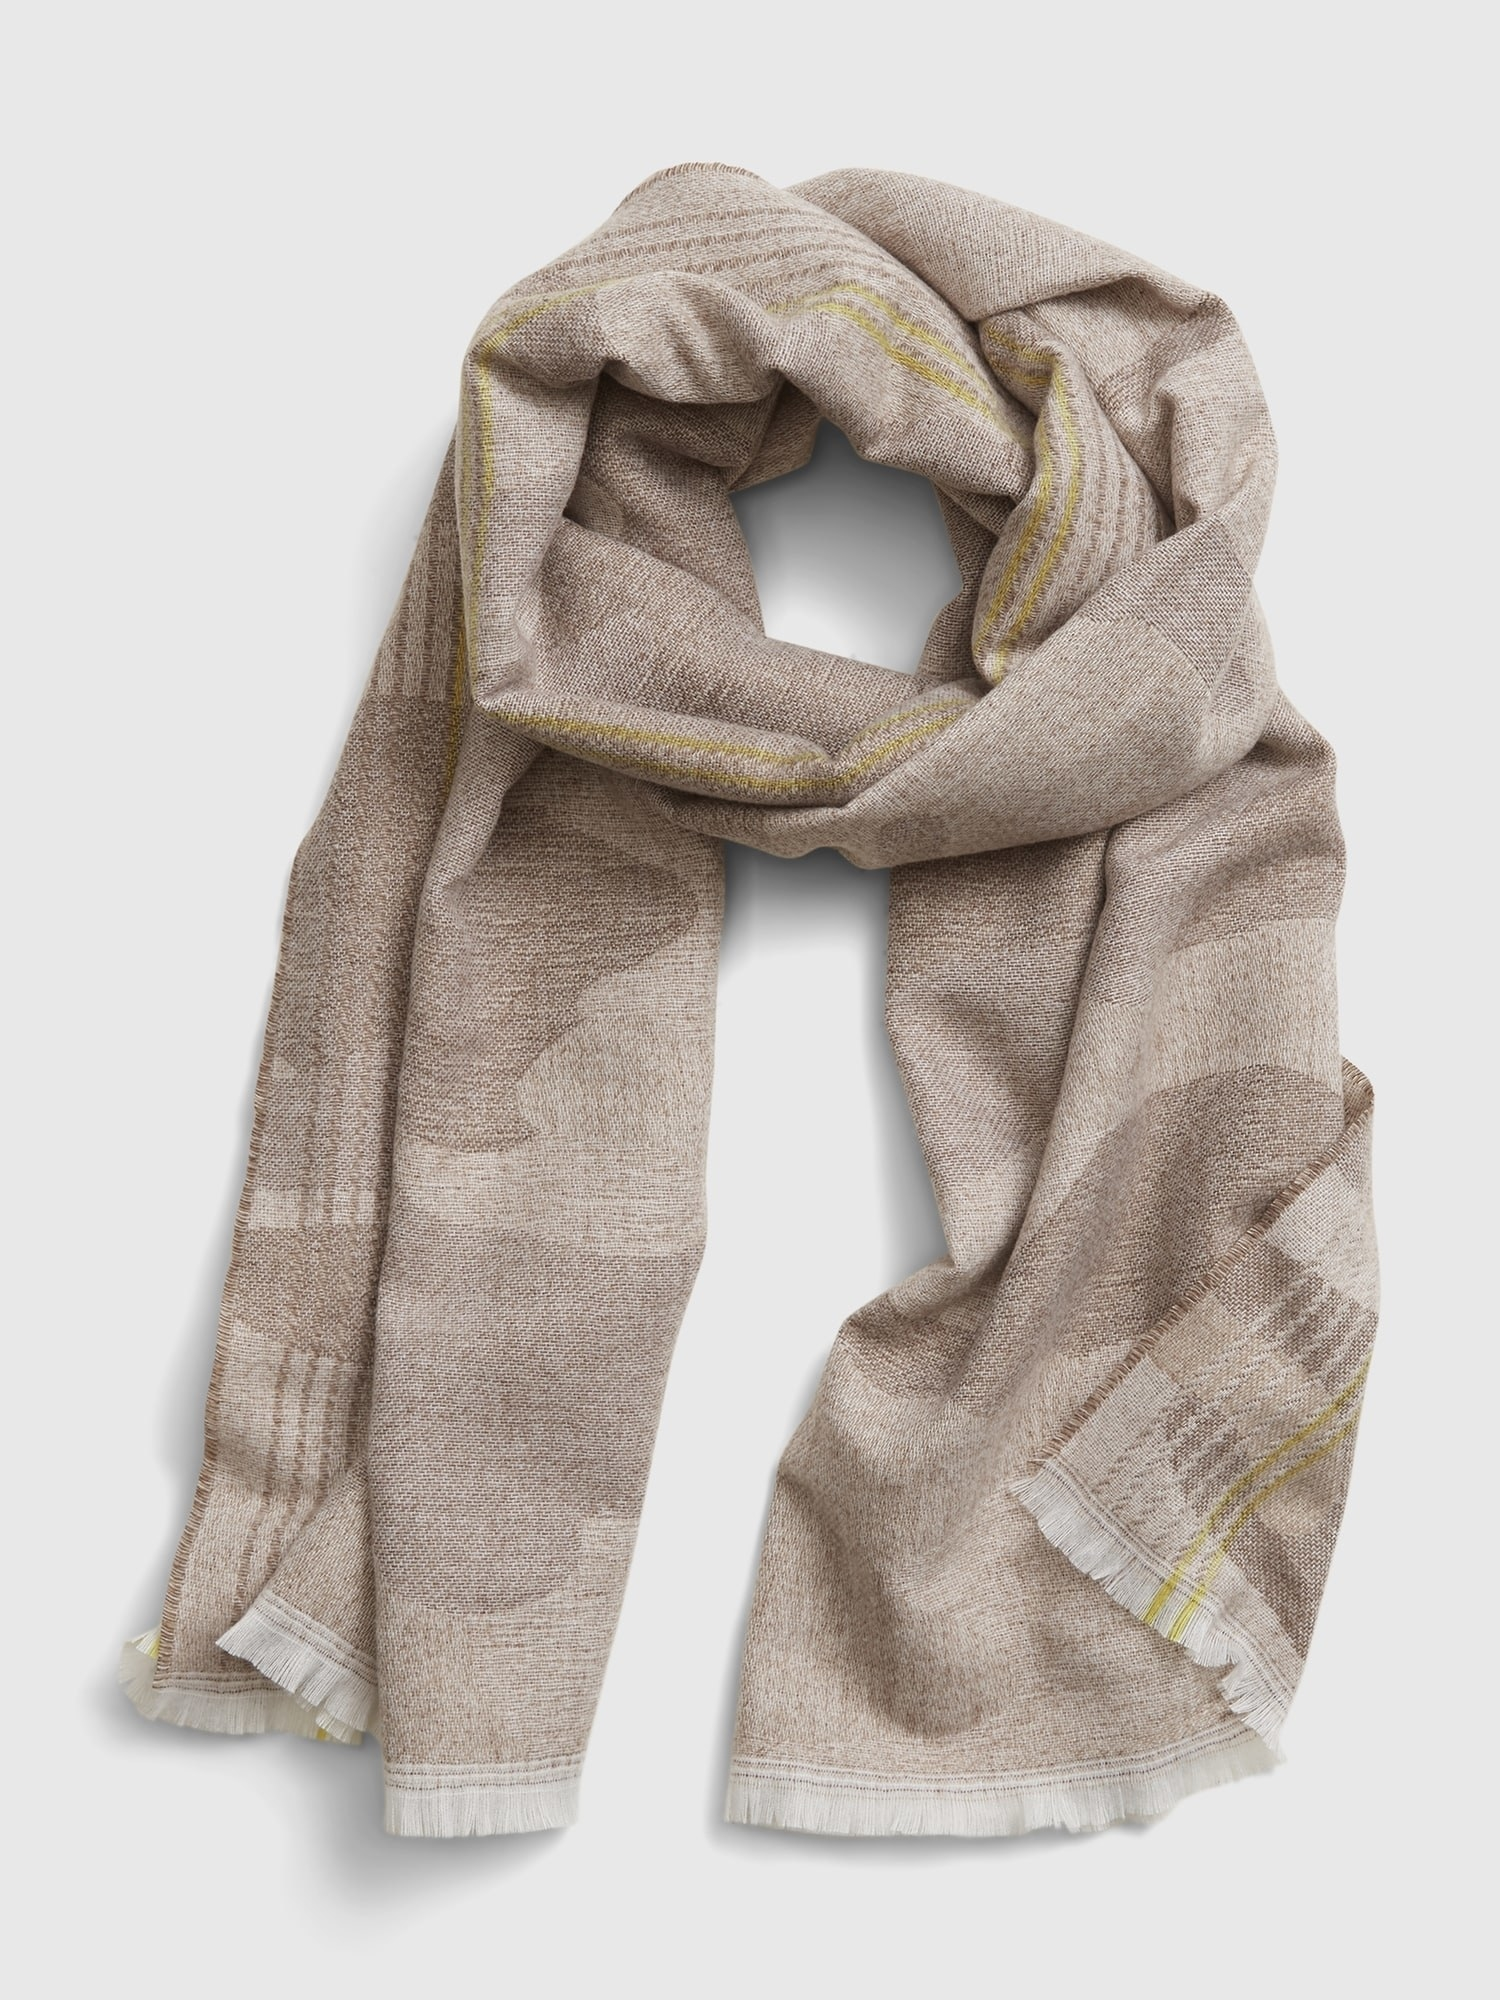 The beige camo scarf